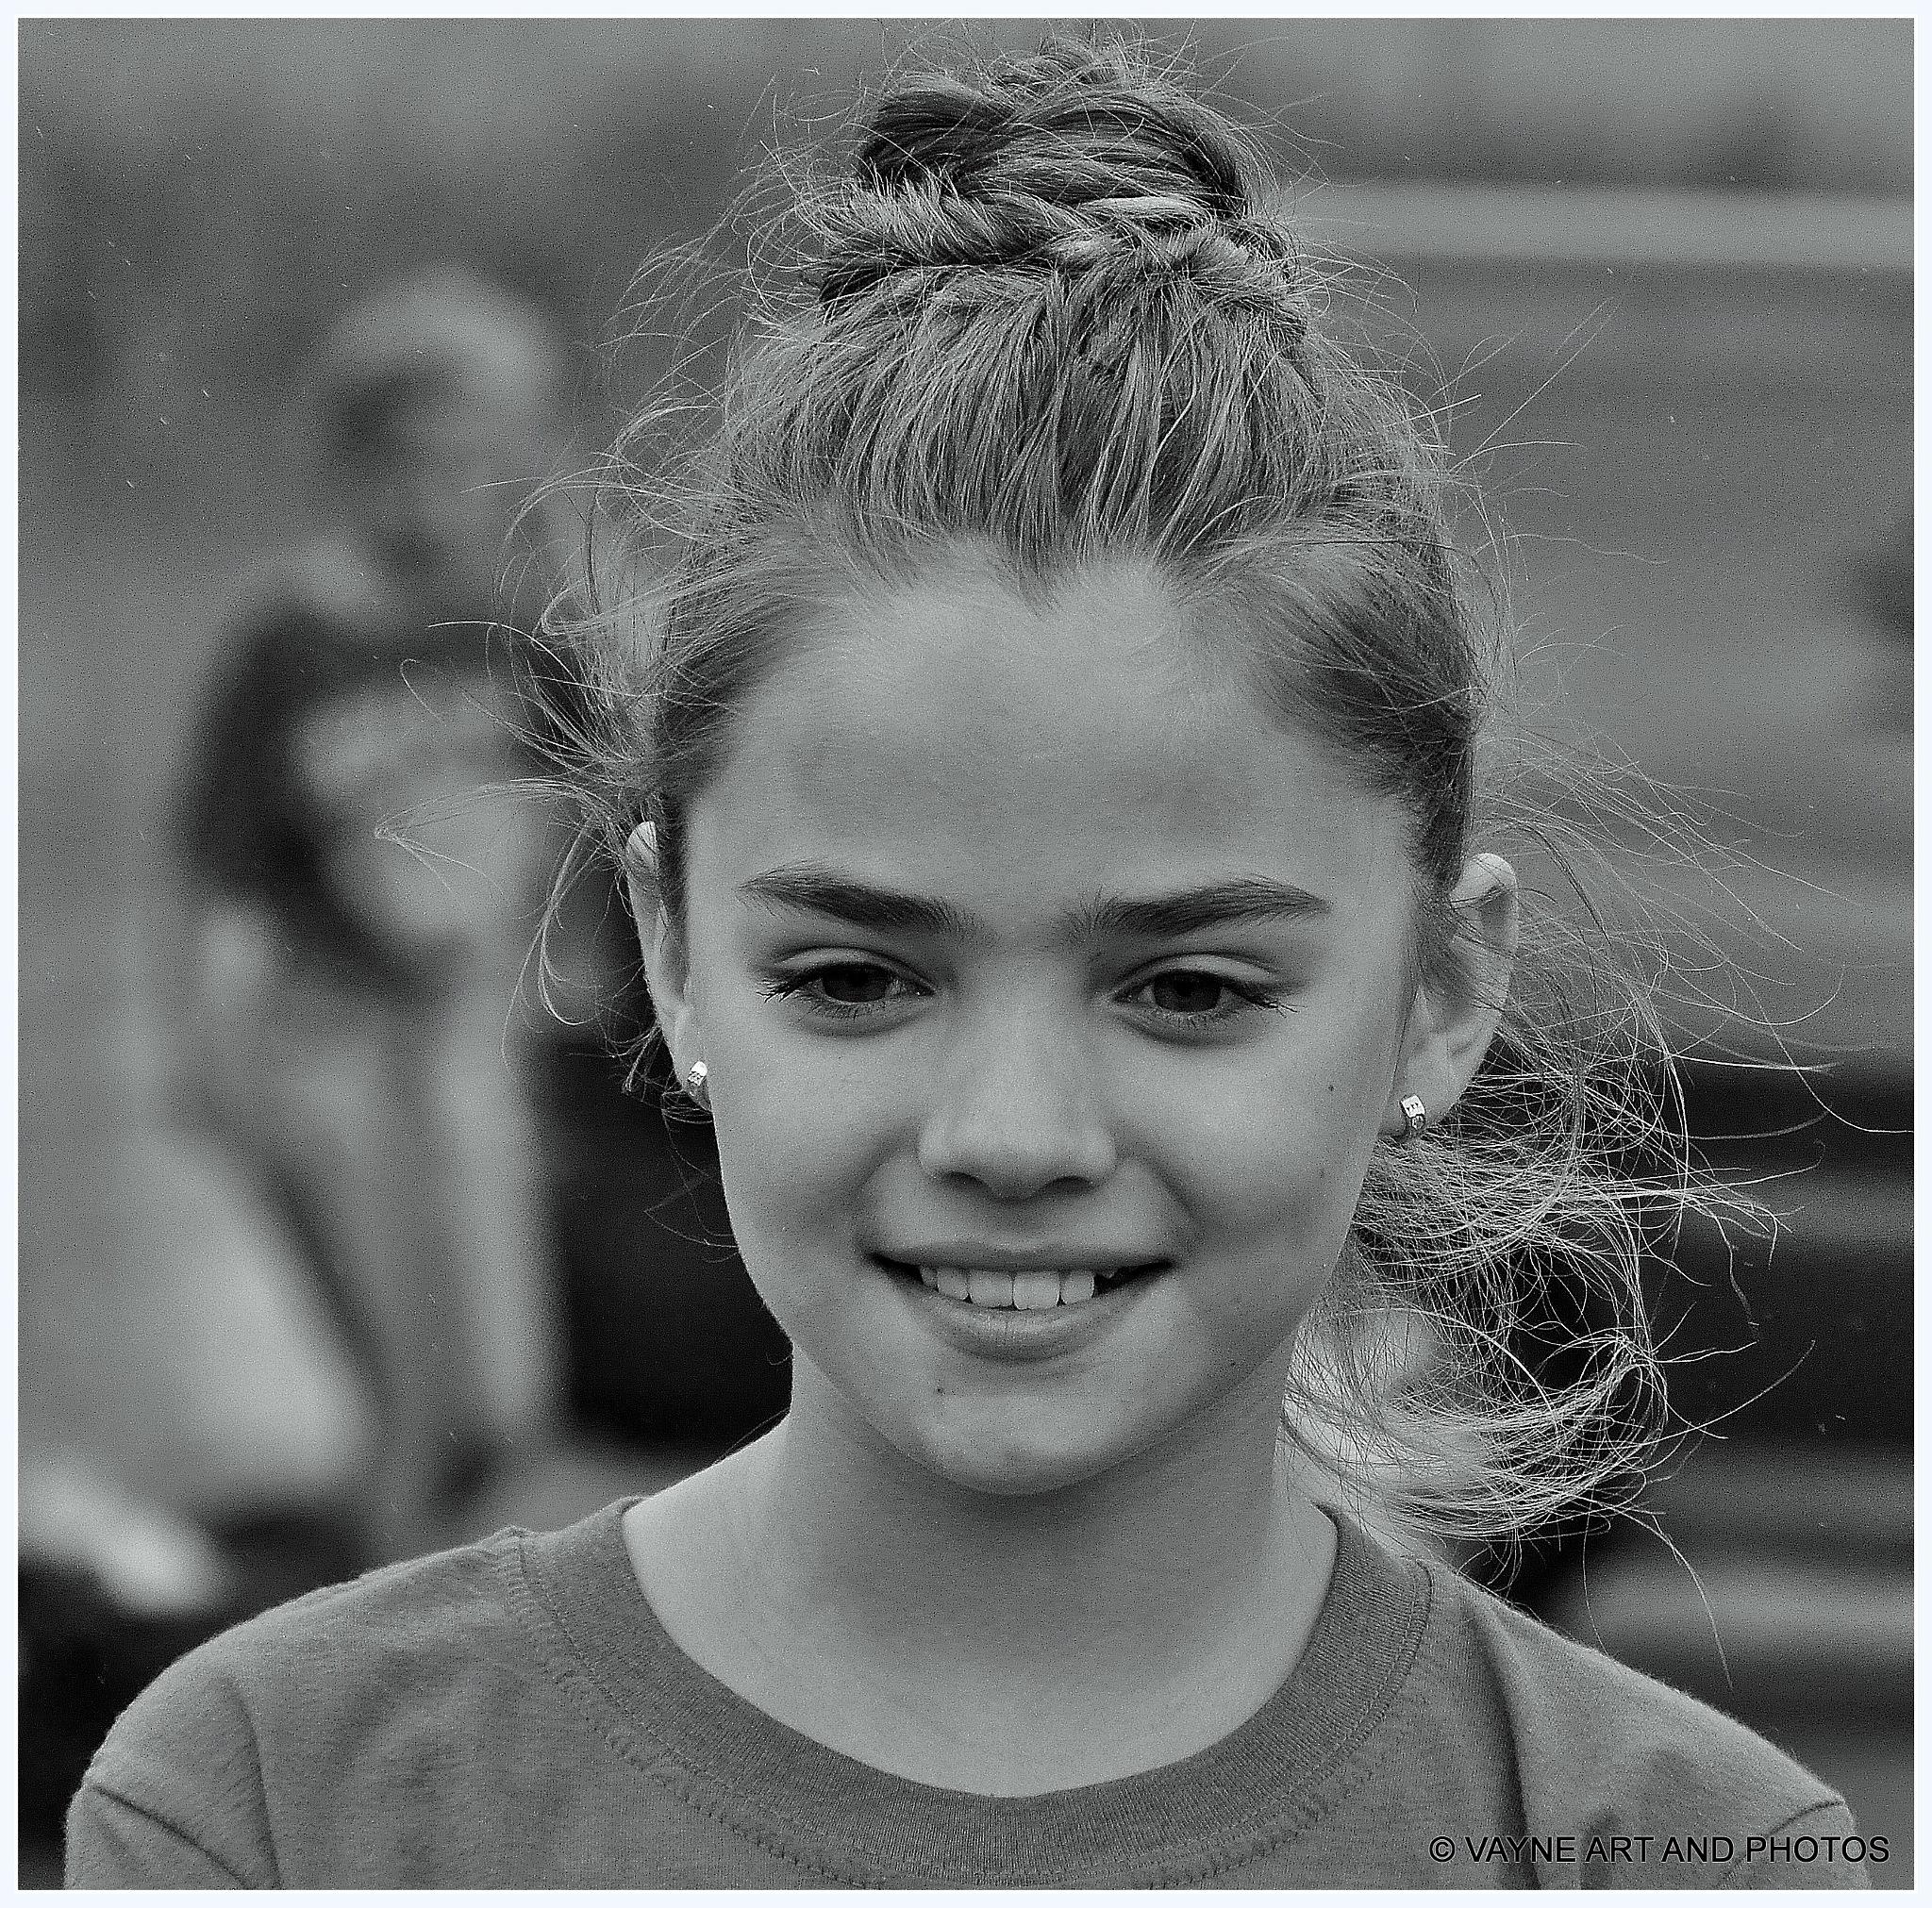 Young lady by Jacob van der Veen